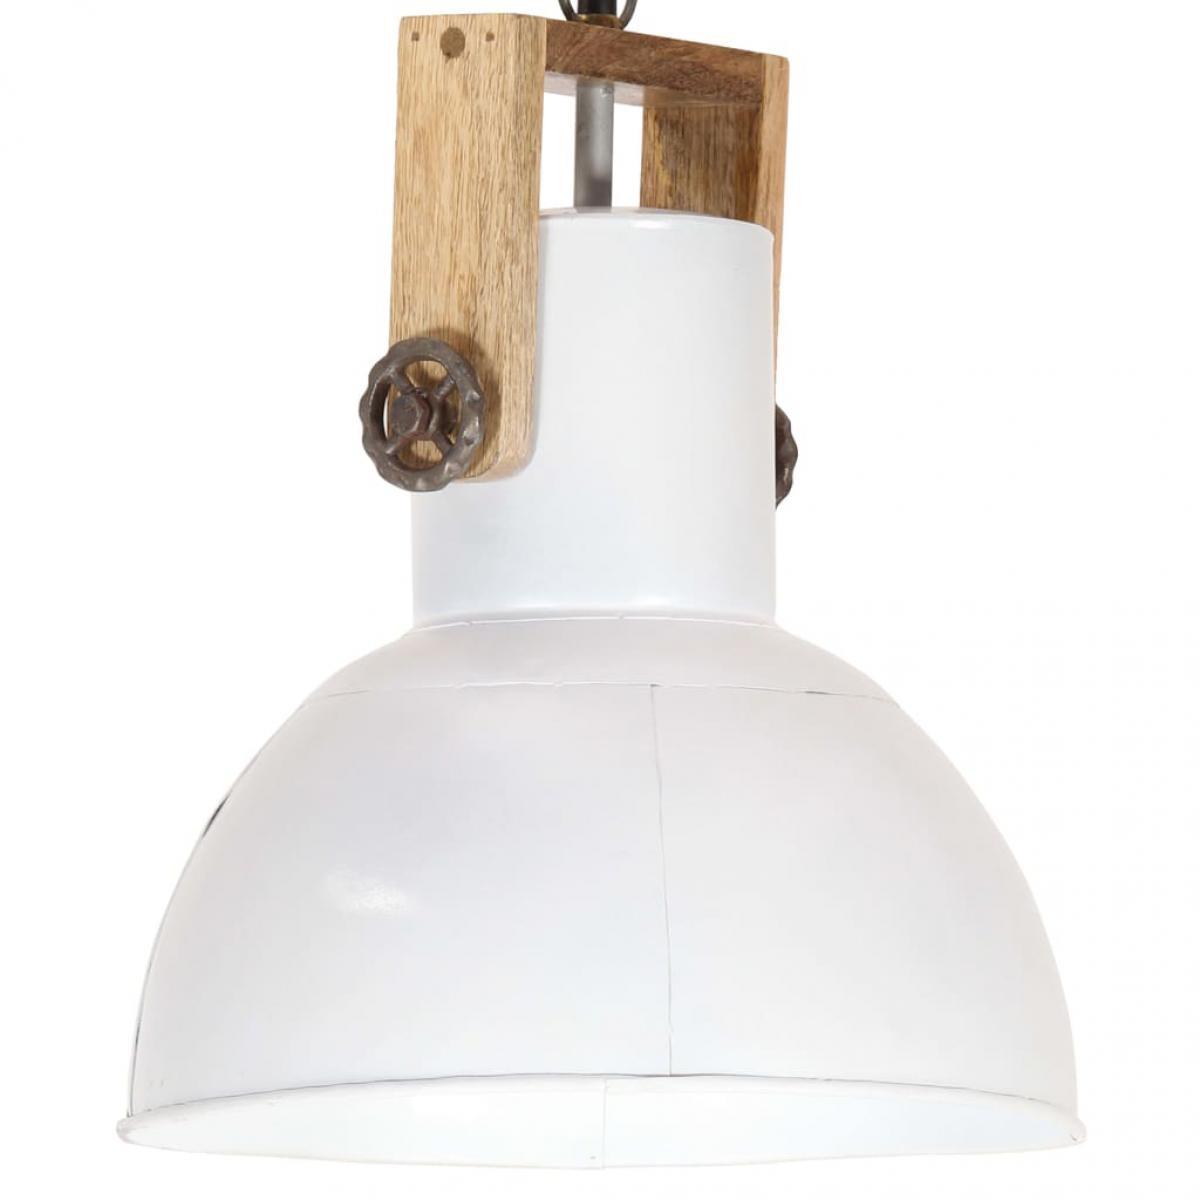 Vidaxl vidaXL Lampe suspendue industrielle 25 W Blanc Rond Manguier 32 cm E27